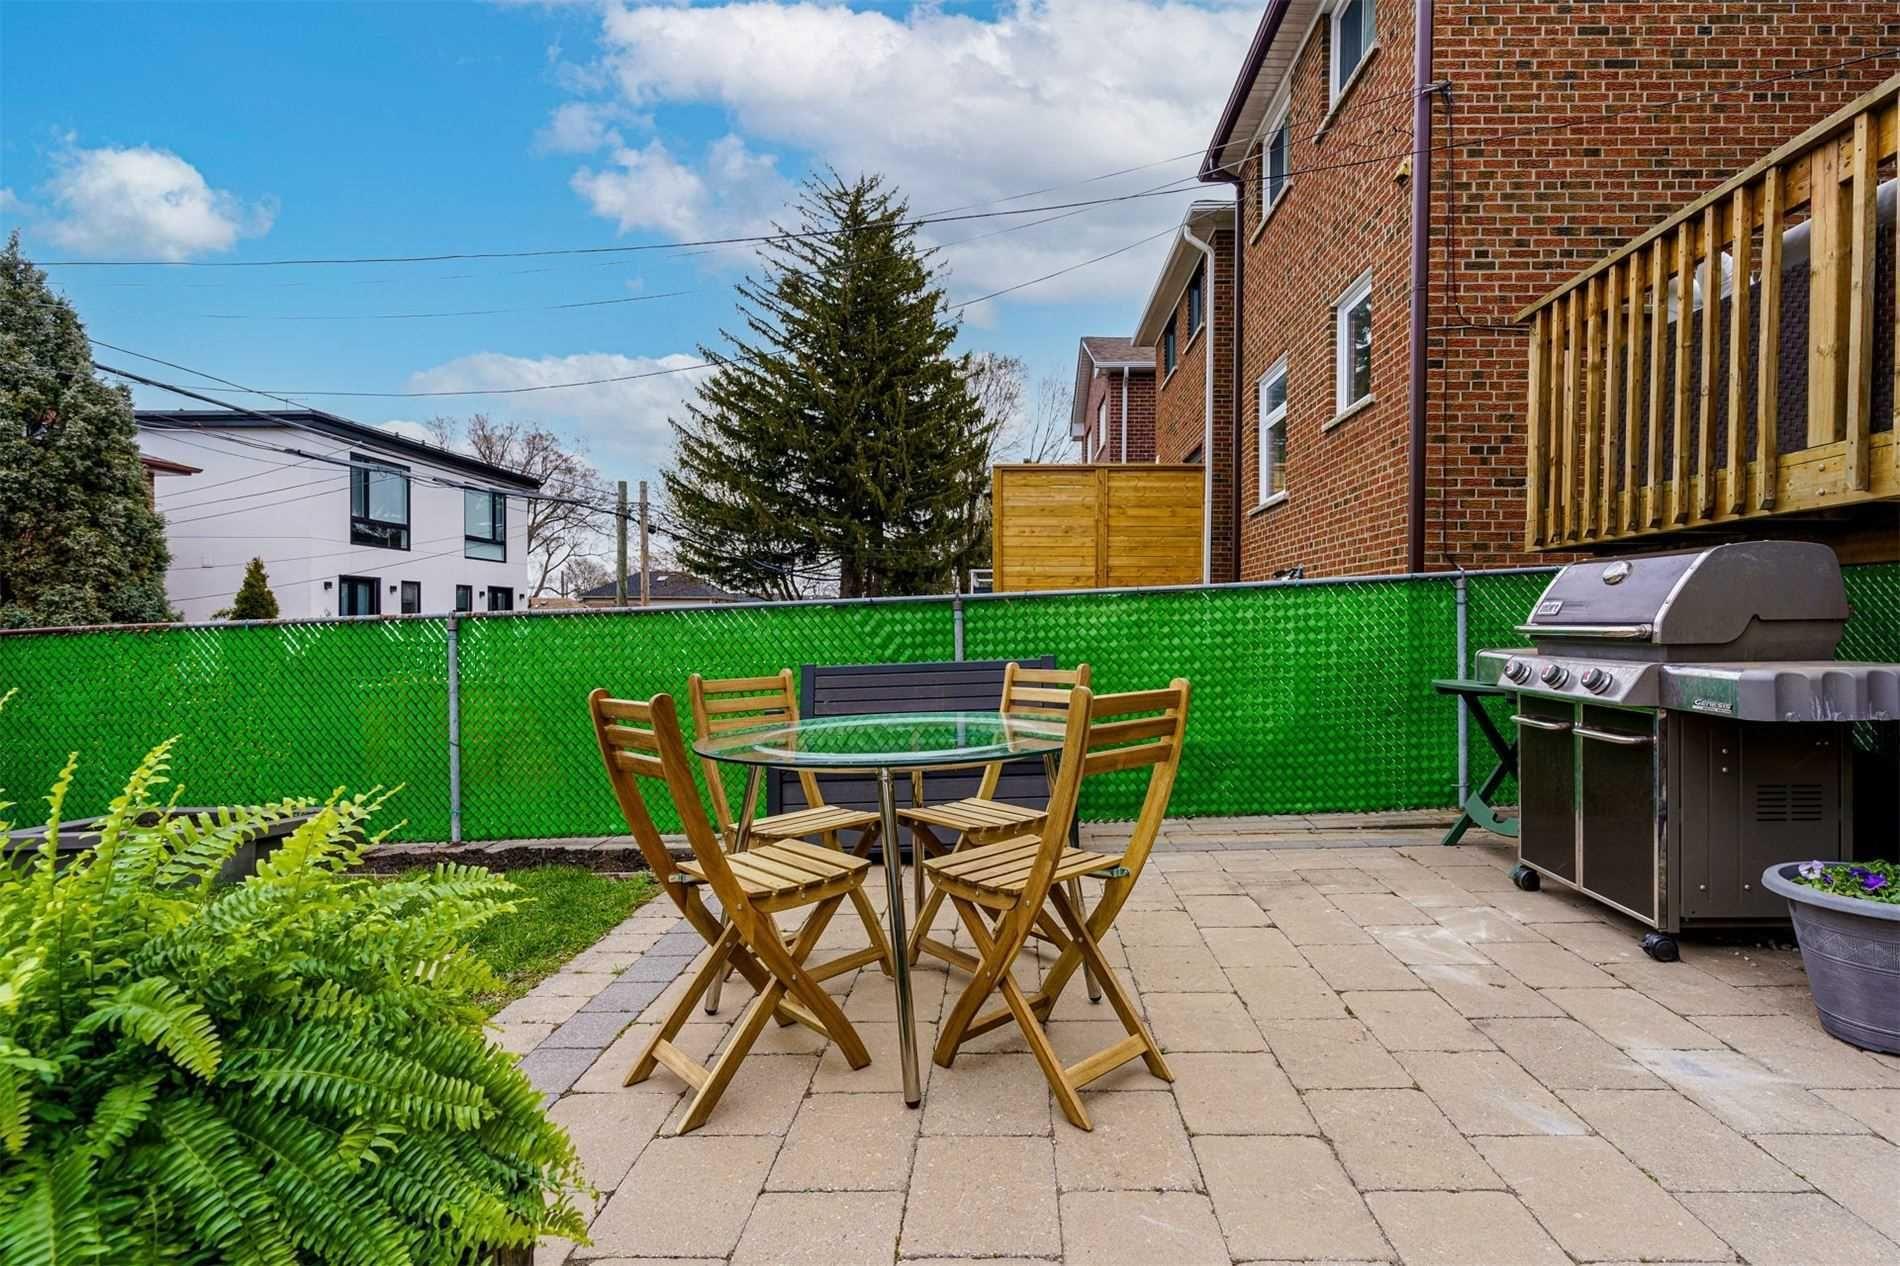 Photo 36: Photos: 92 Holborne Avenue in Toronto: Danforth Village-East York House (2-Storey) for sale (Toronto E03)  : MLS®# E5204452